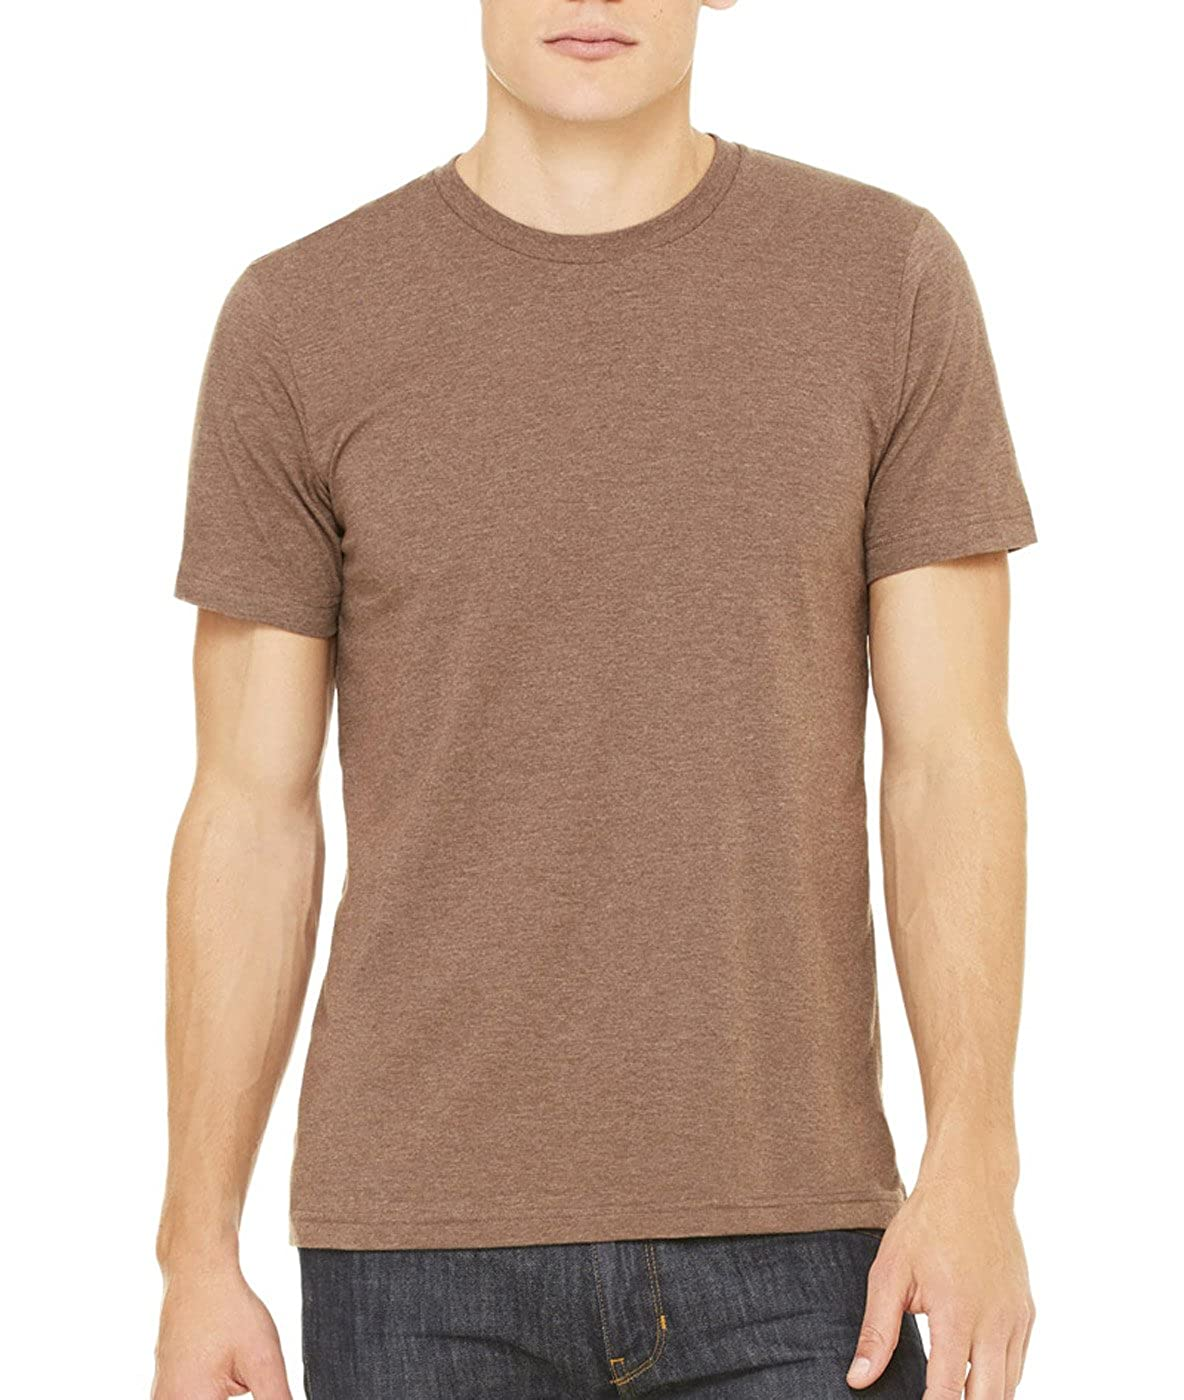 3XL Canvas Jersey Short-Sleeve T-Shirt Bella Heather Brown 3001C